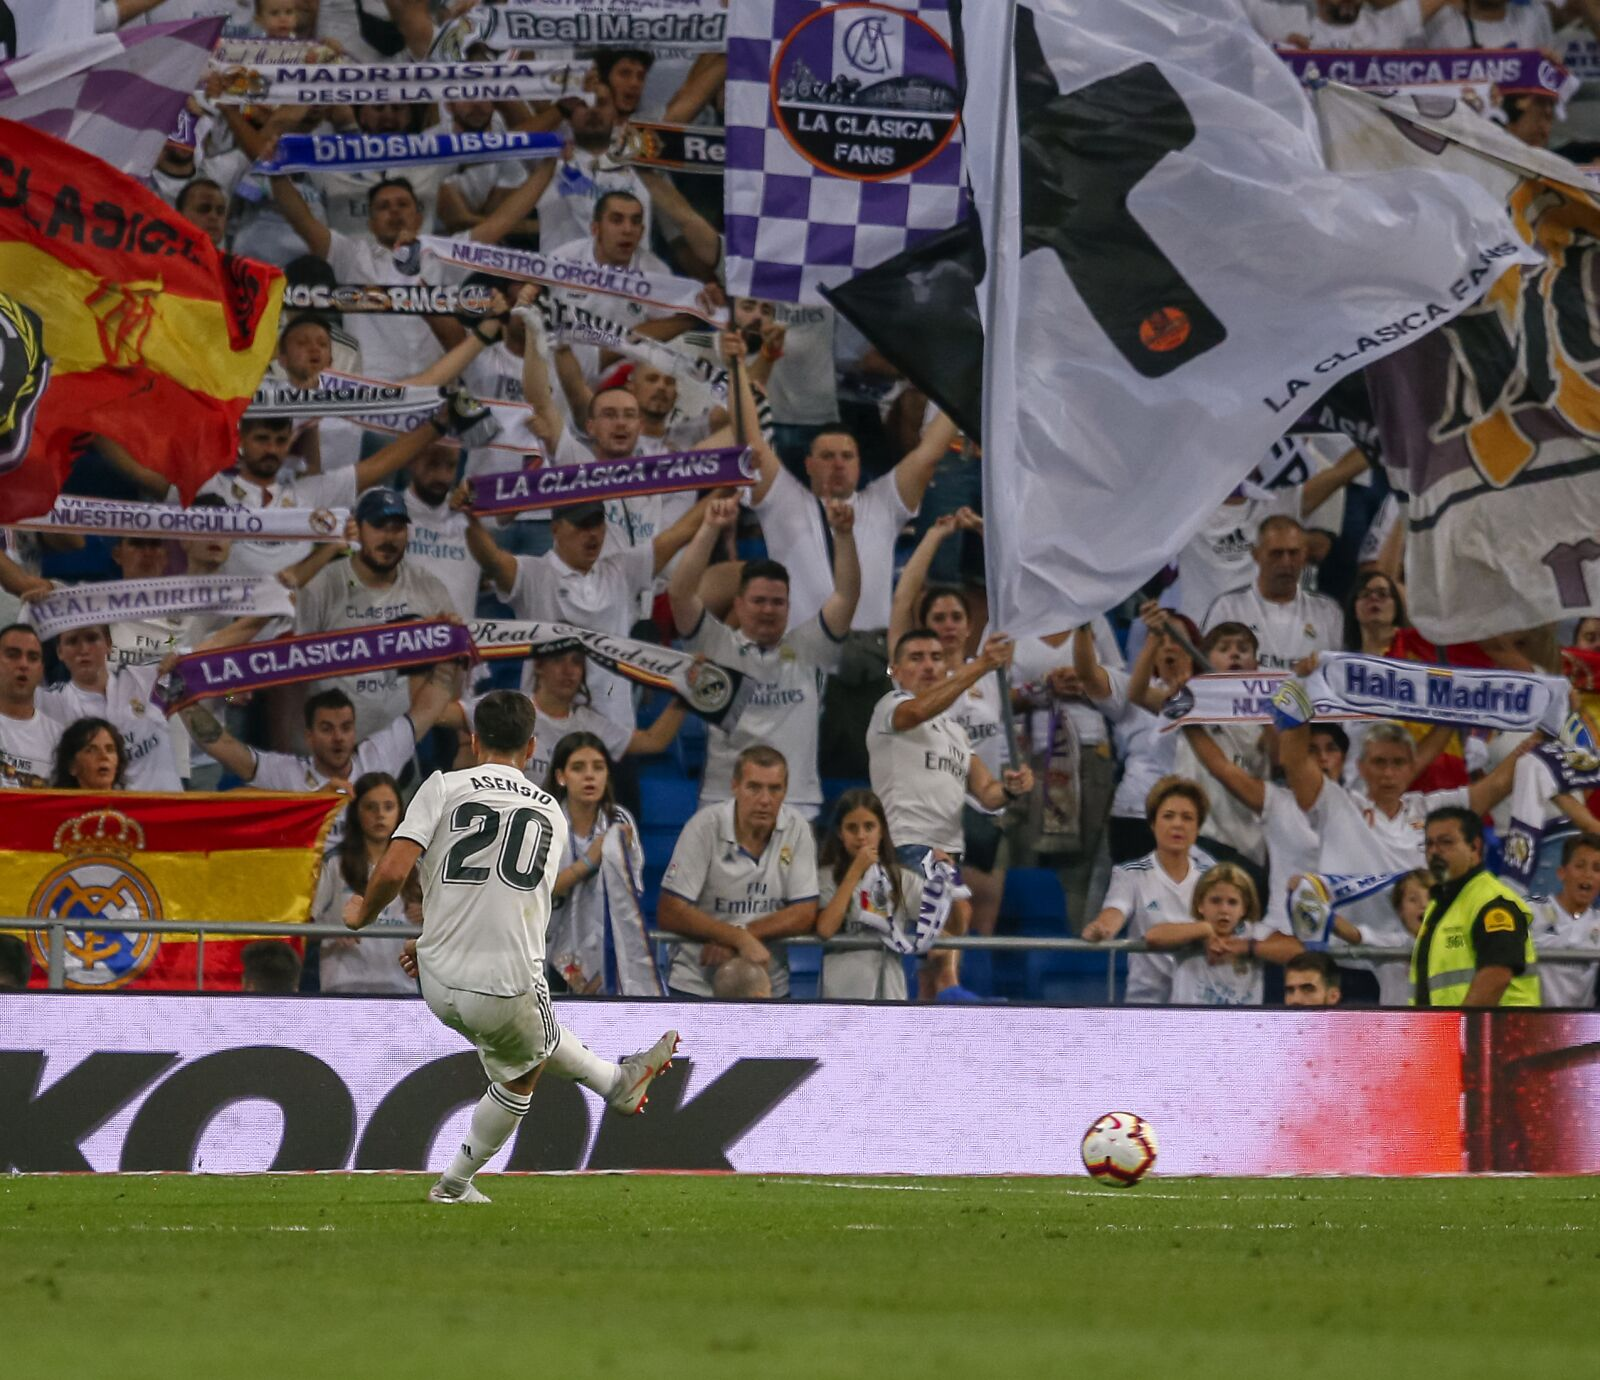 Real Madrid player ratings vs Espanyol- Defensive mids win the game